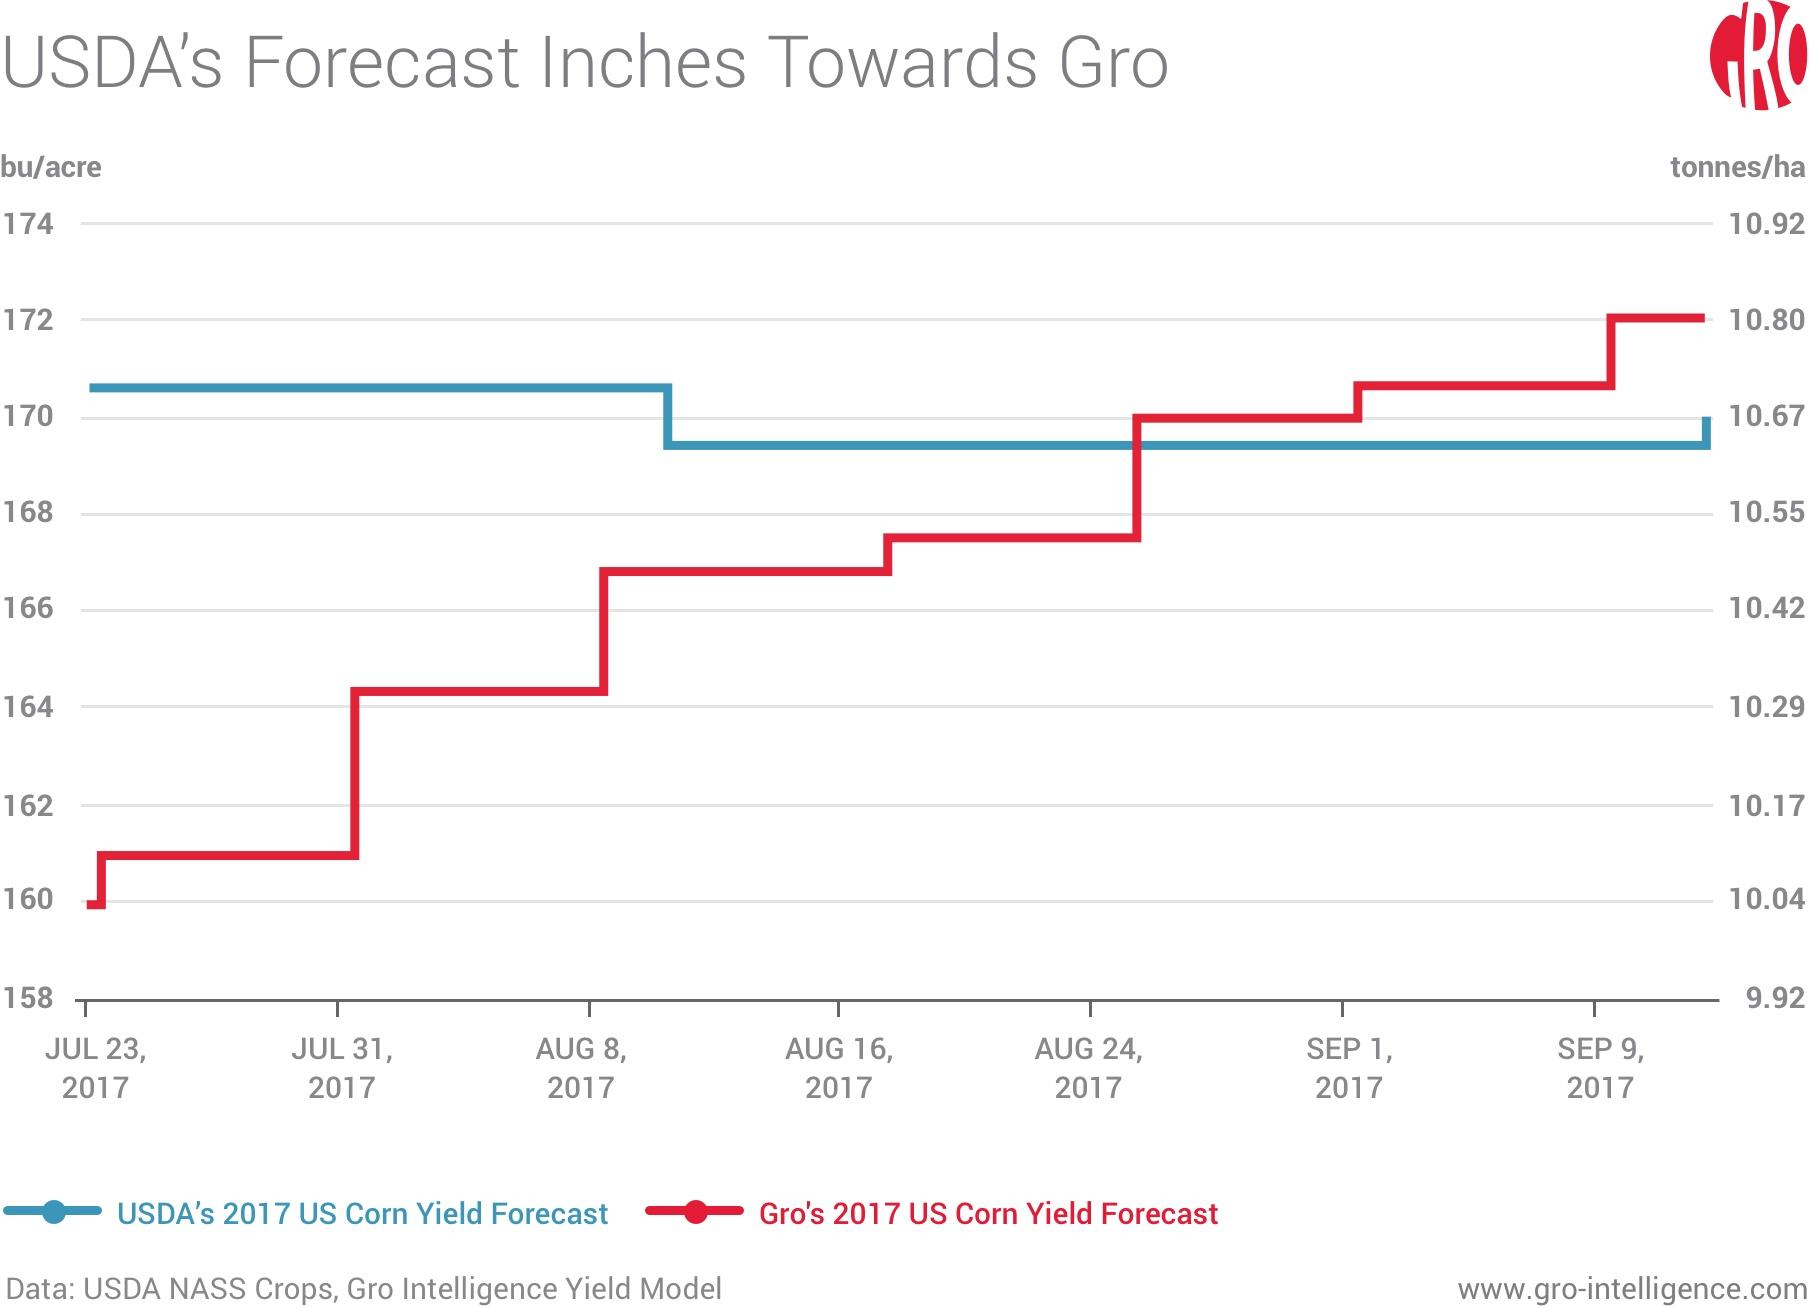 USDA's Forecast Inches Towards Gro